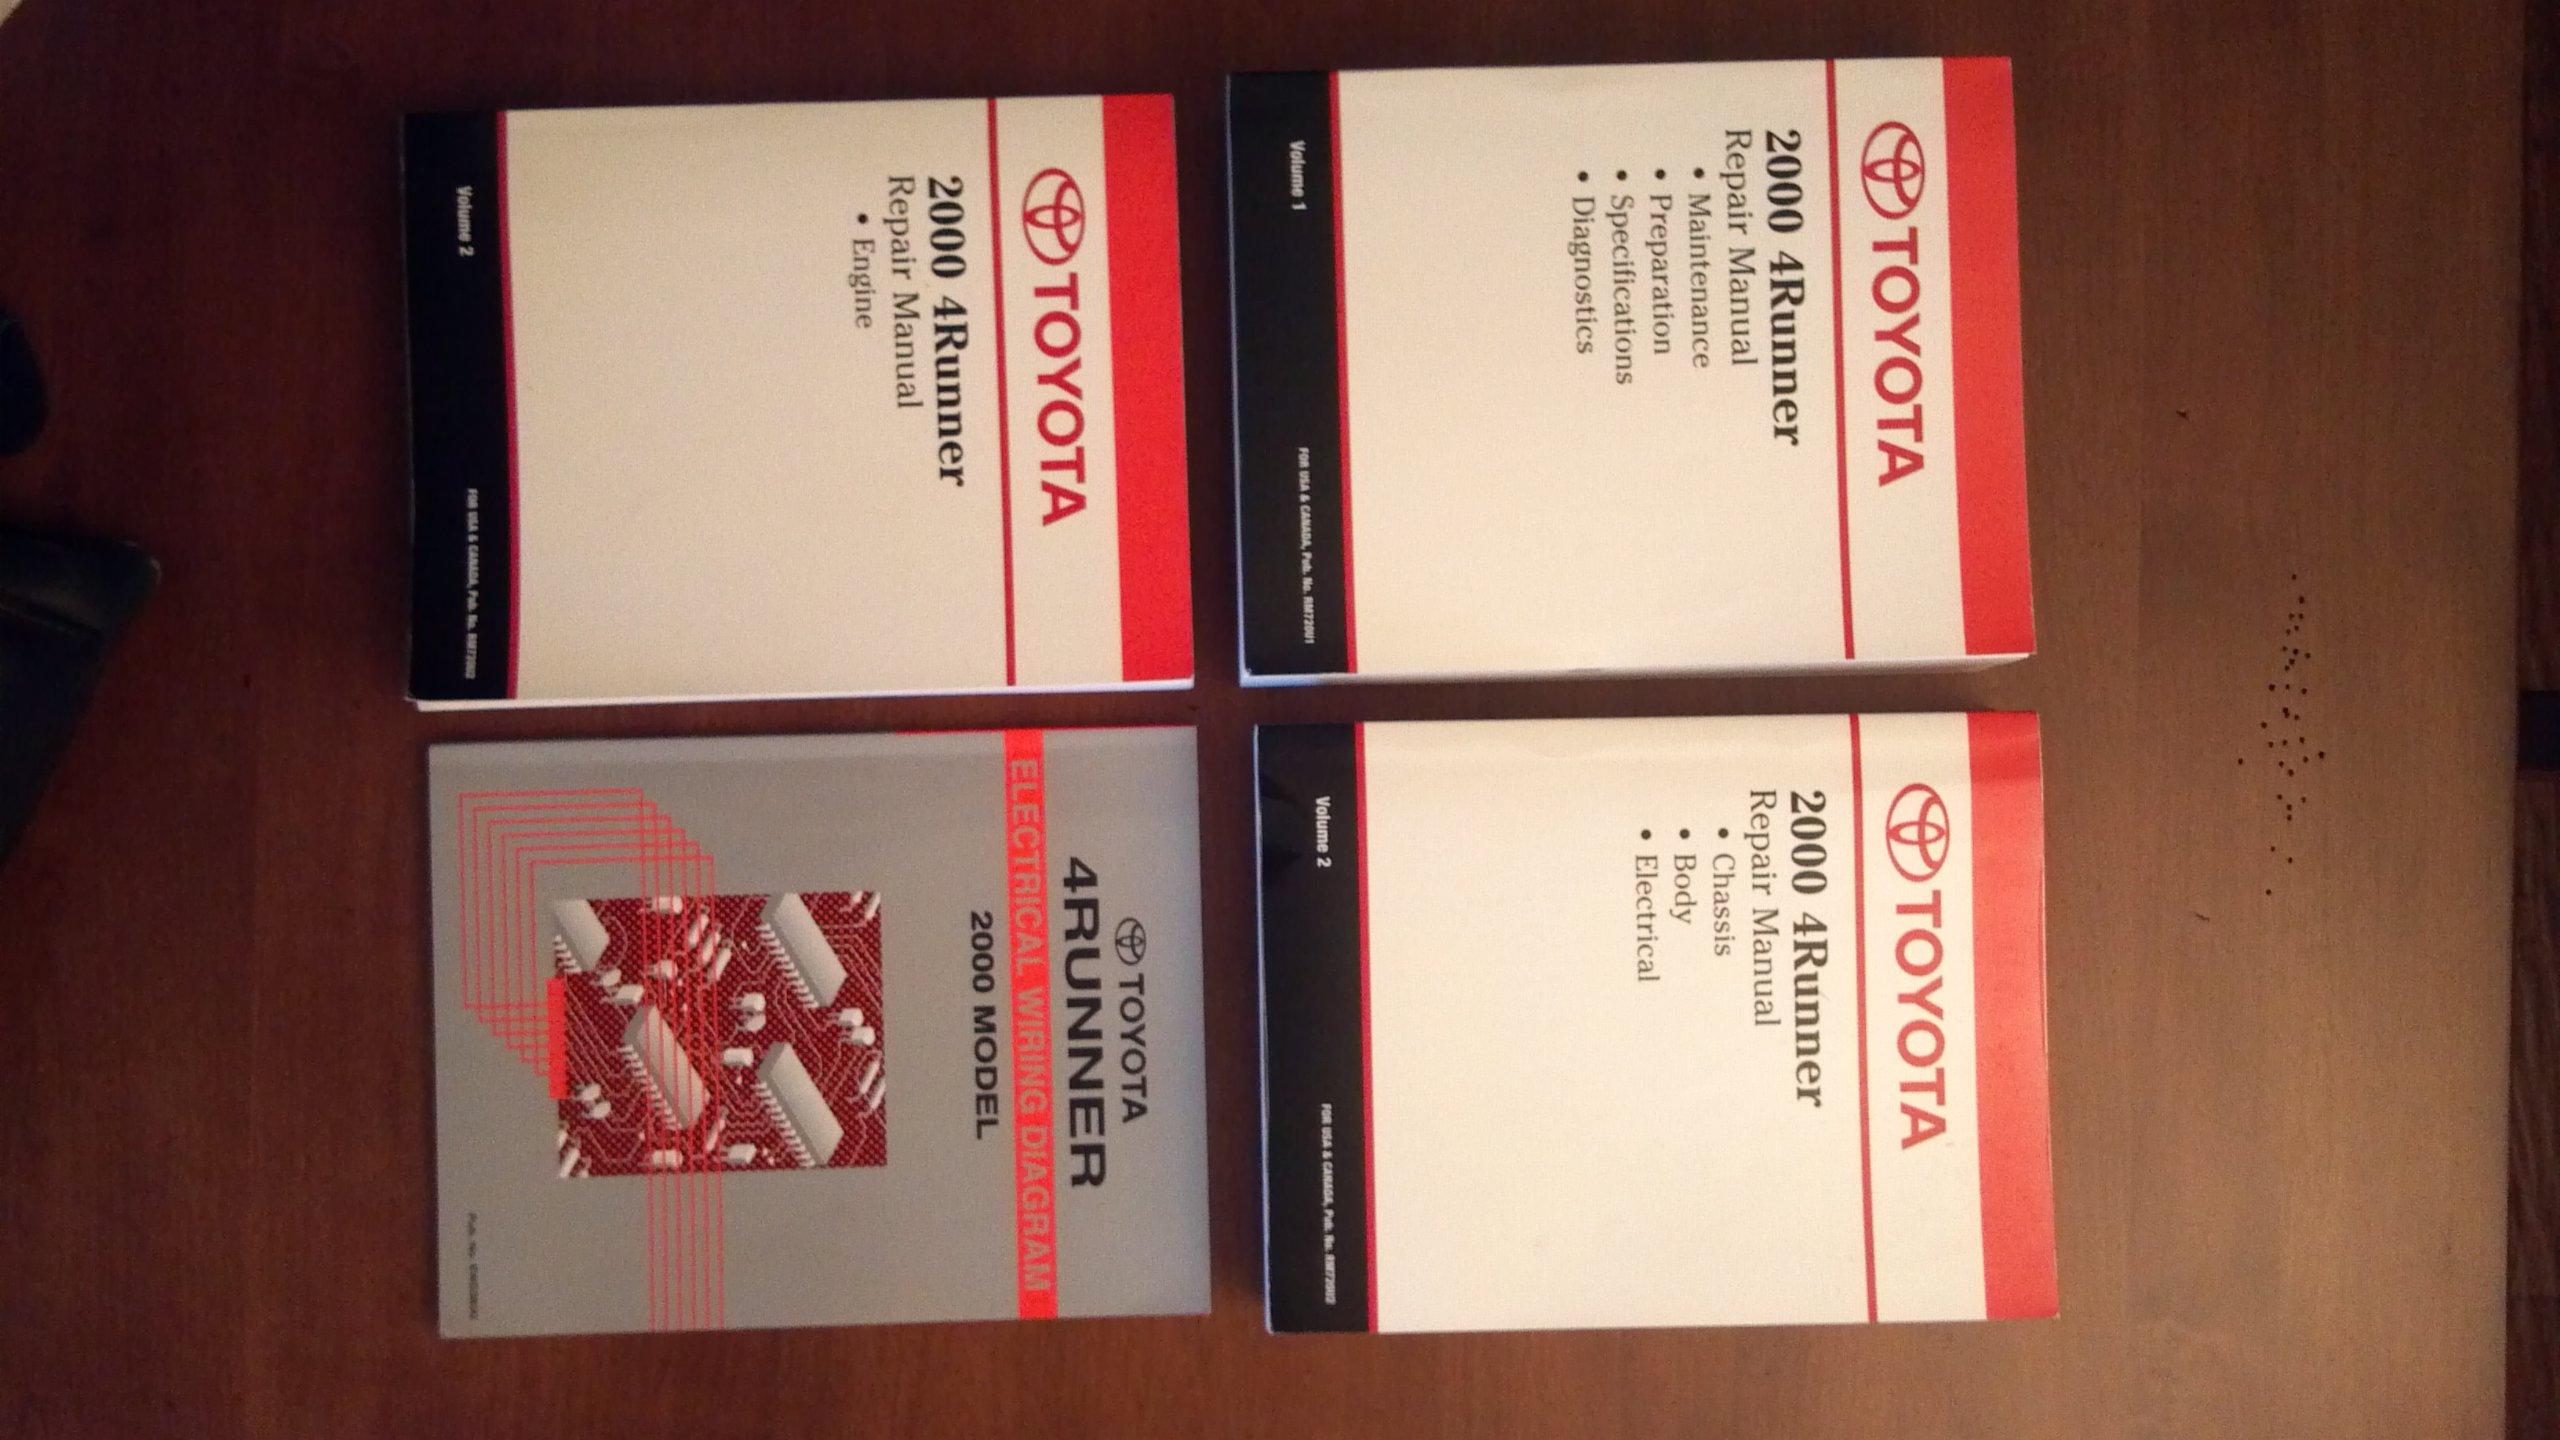 Toyota Motor Corporation 2000 4Runner Manual Set: Toyota